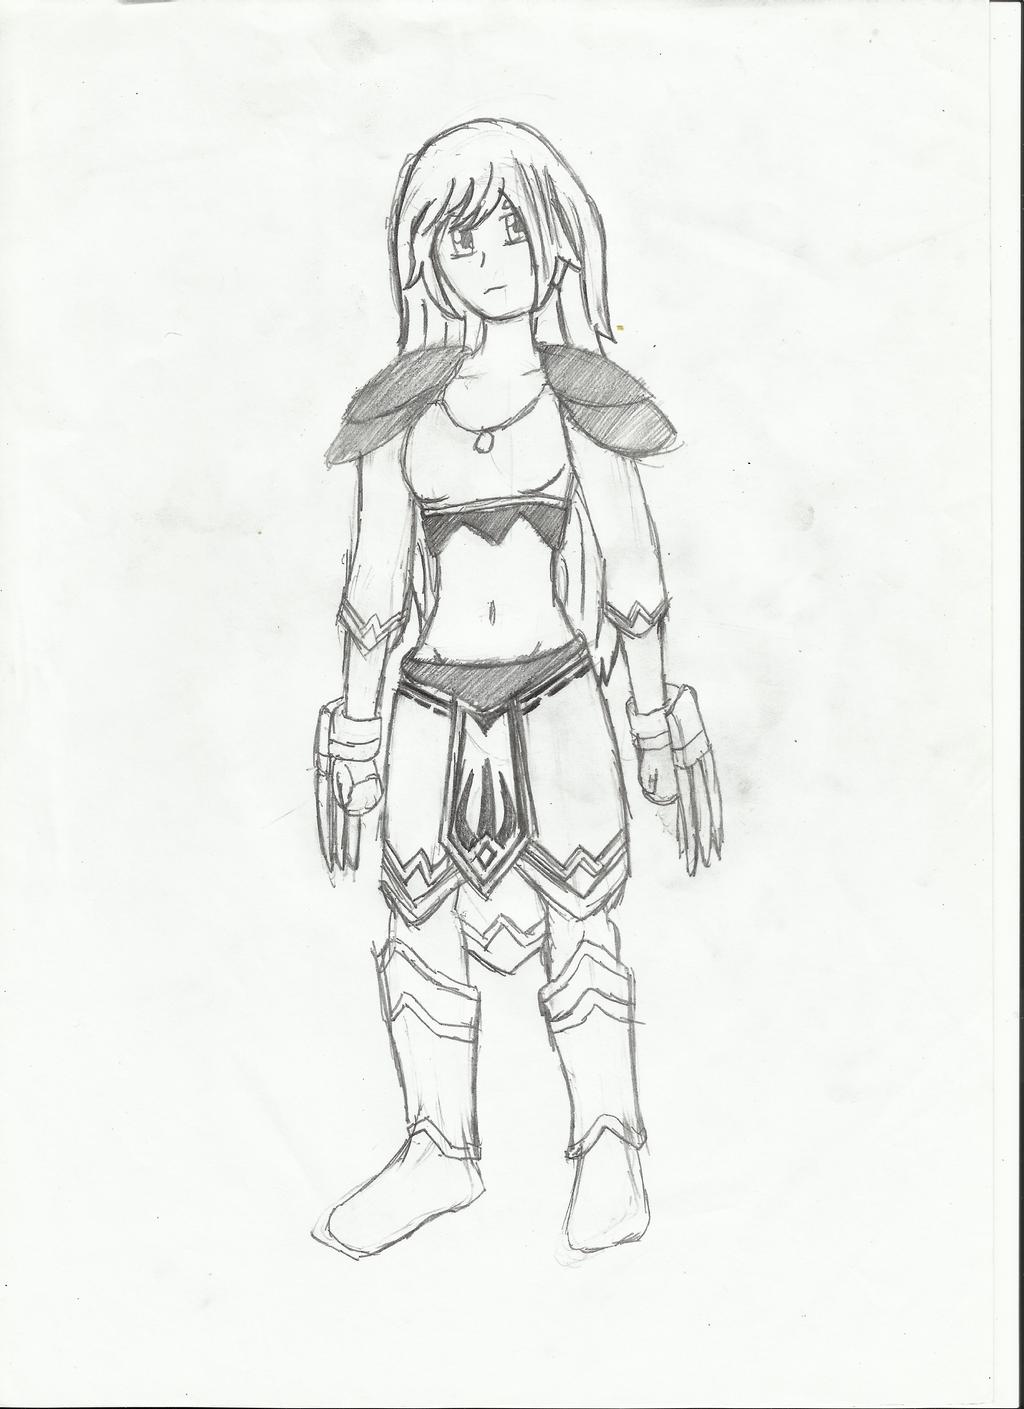 Redwind sketch by AeonAGV